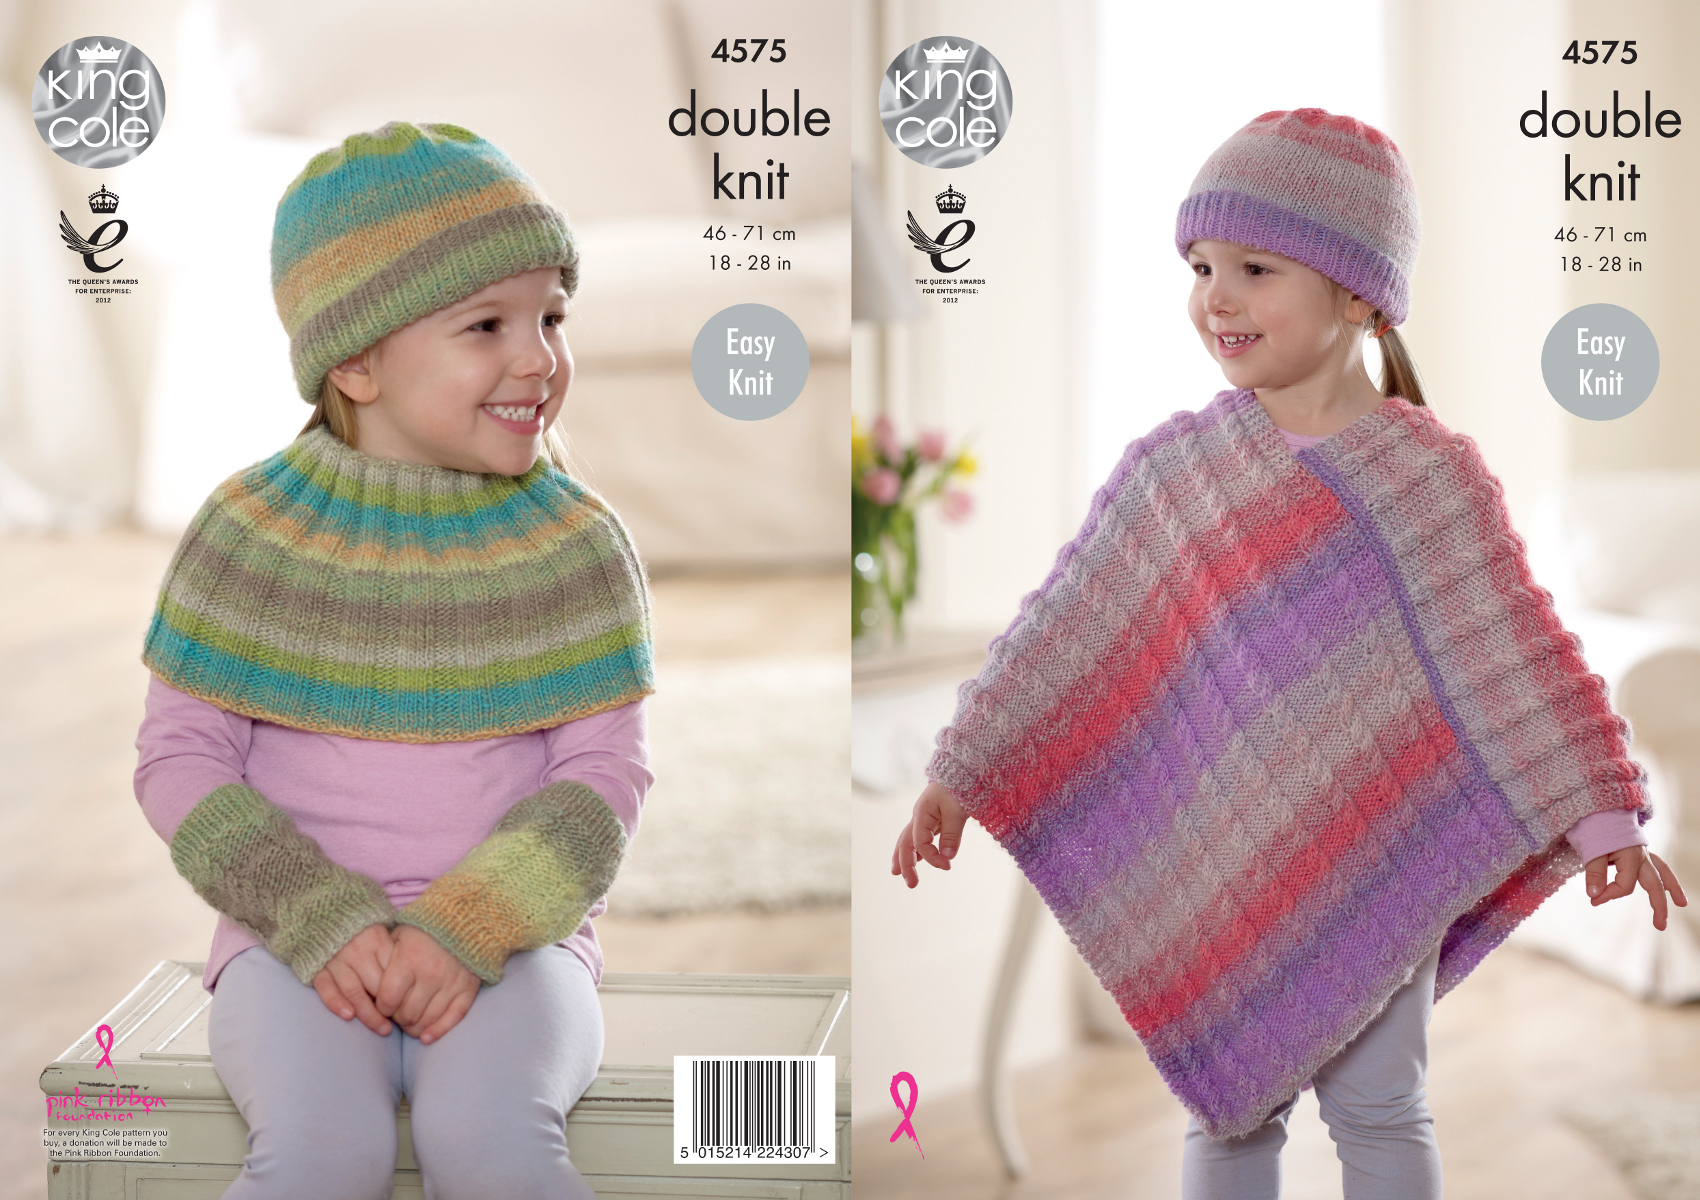 King Cole Knitting Pattern 3318 : Easy Knit Girls Poncho & Winter Accessories Knitting Pattern King Cole DK...